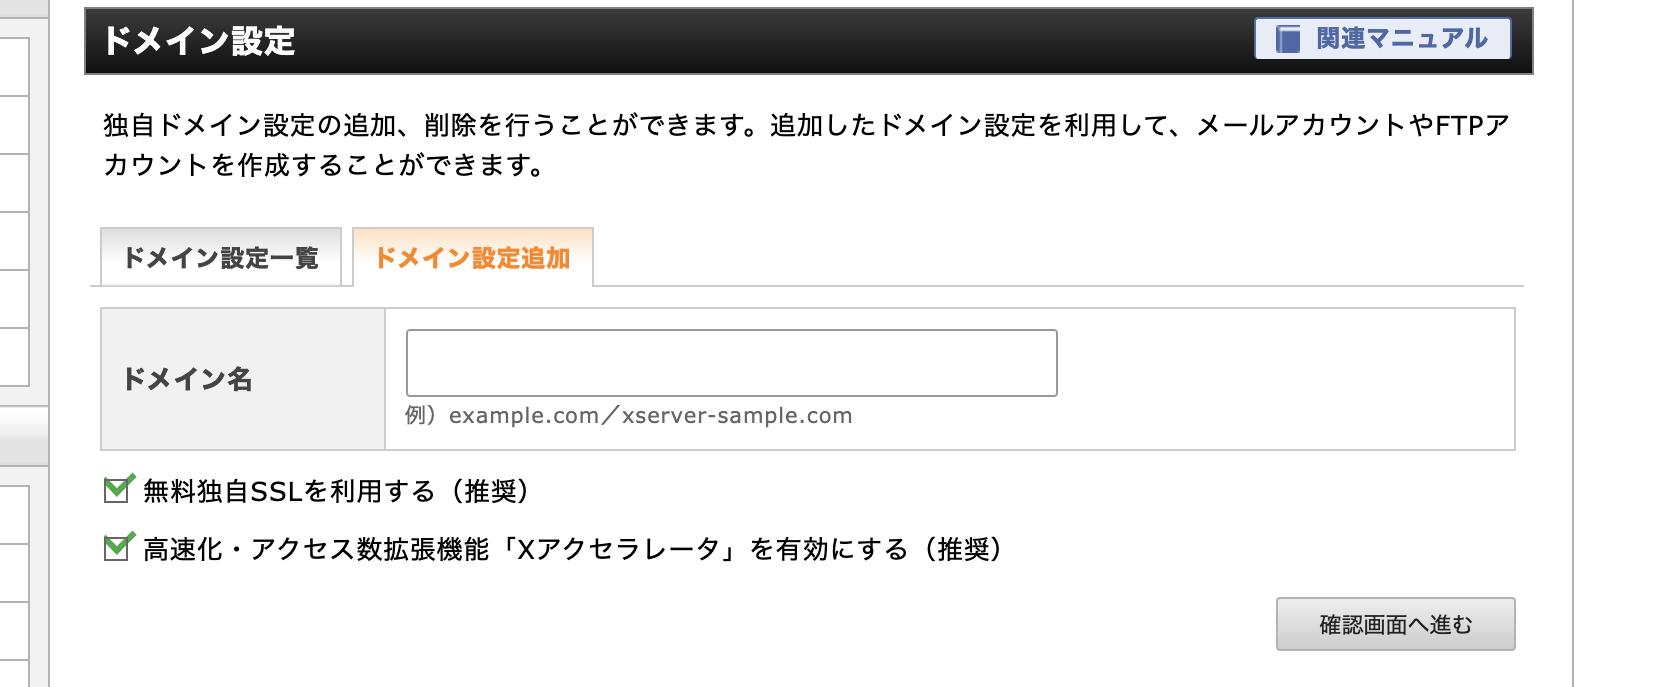 Xserverドメイン設定の画面の画像